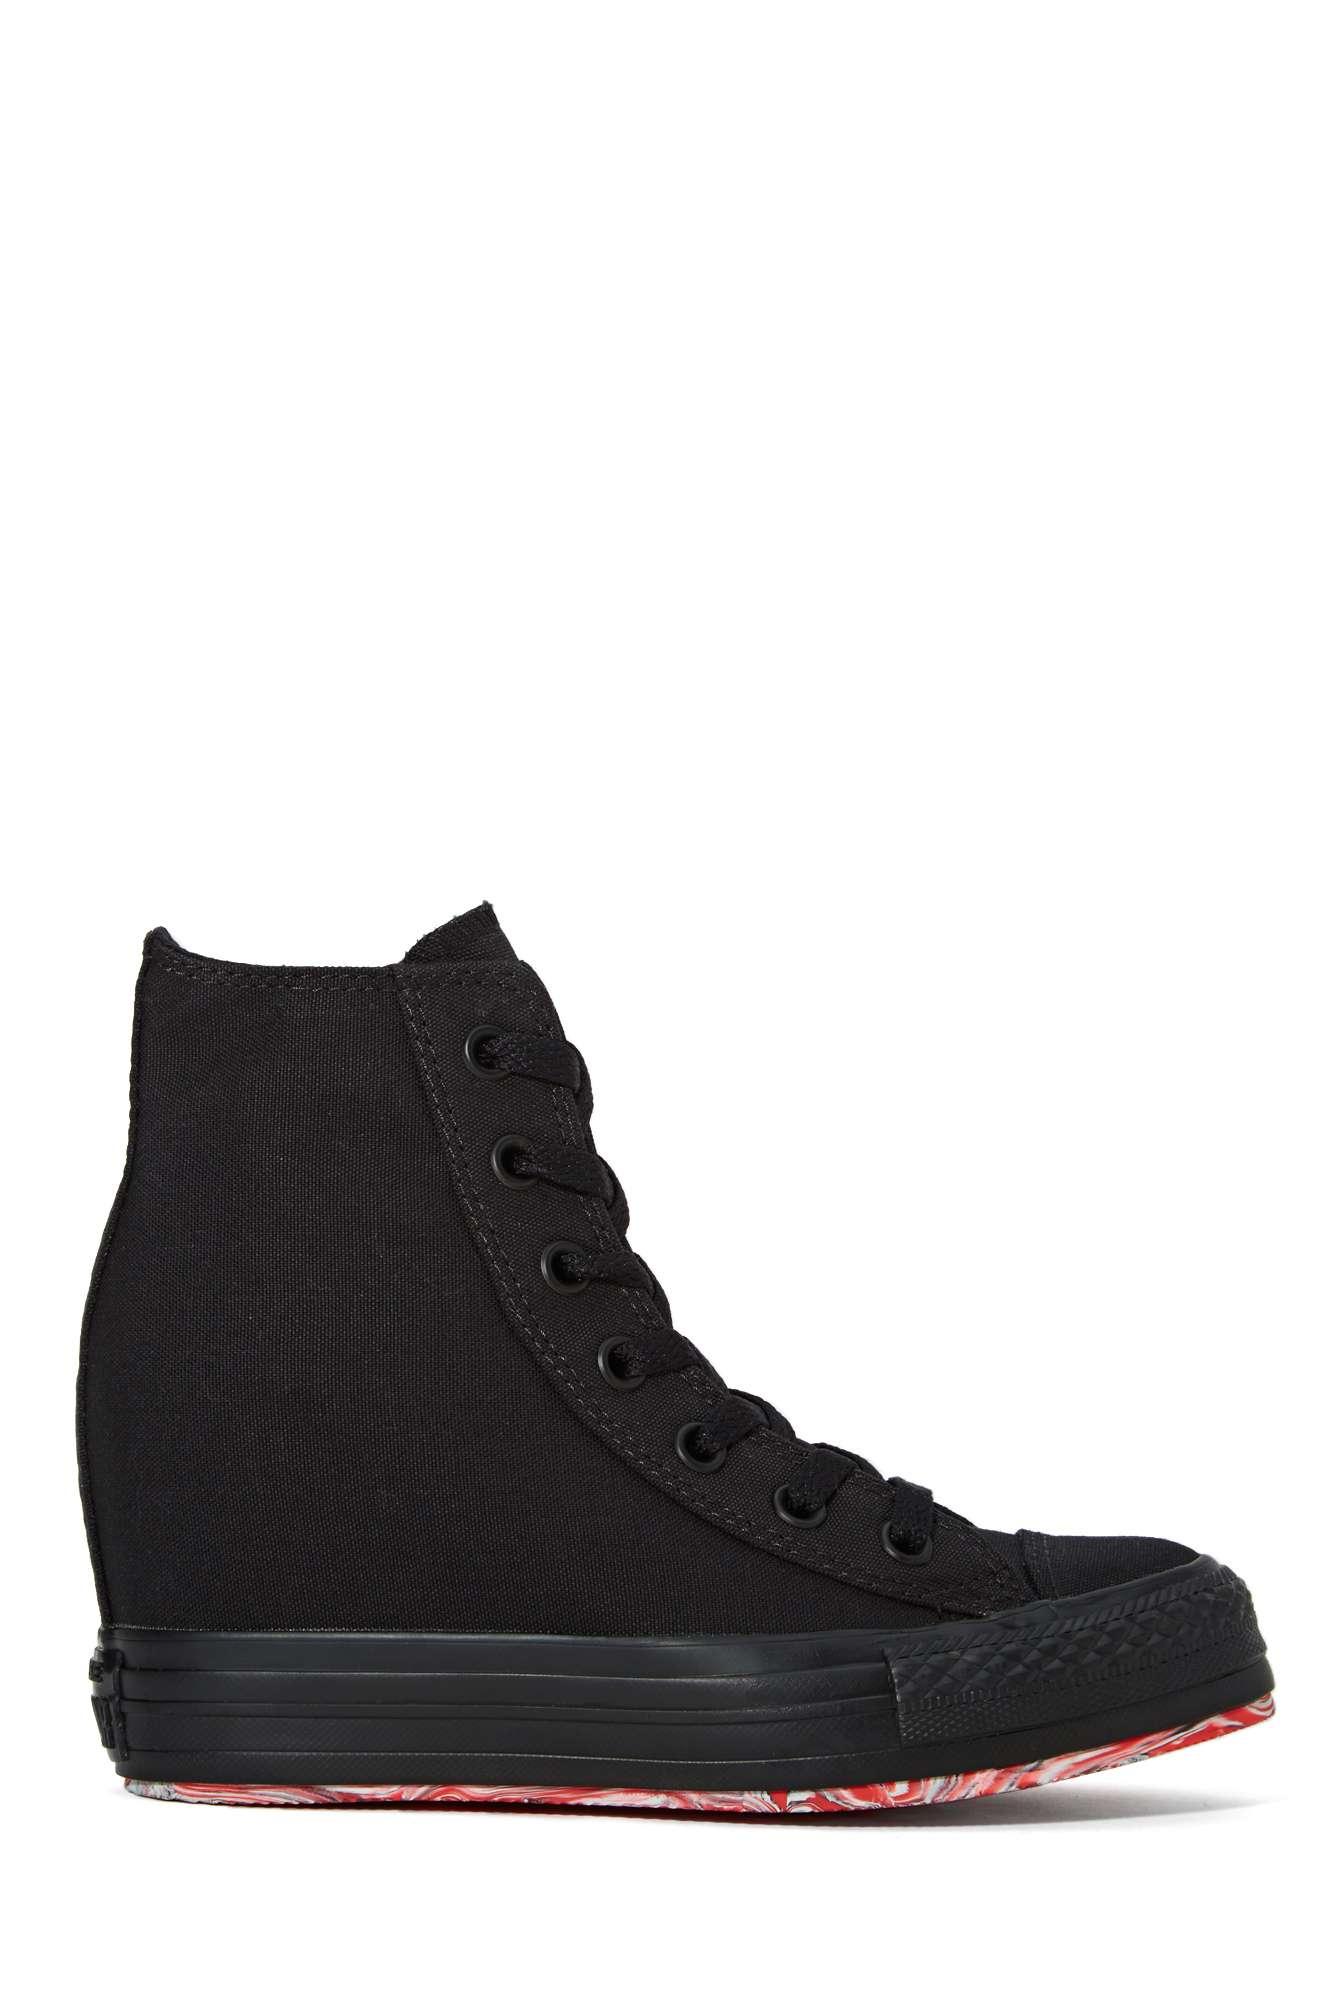 Nasty Gal Converse All Star High Top Platform Sneaker